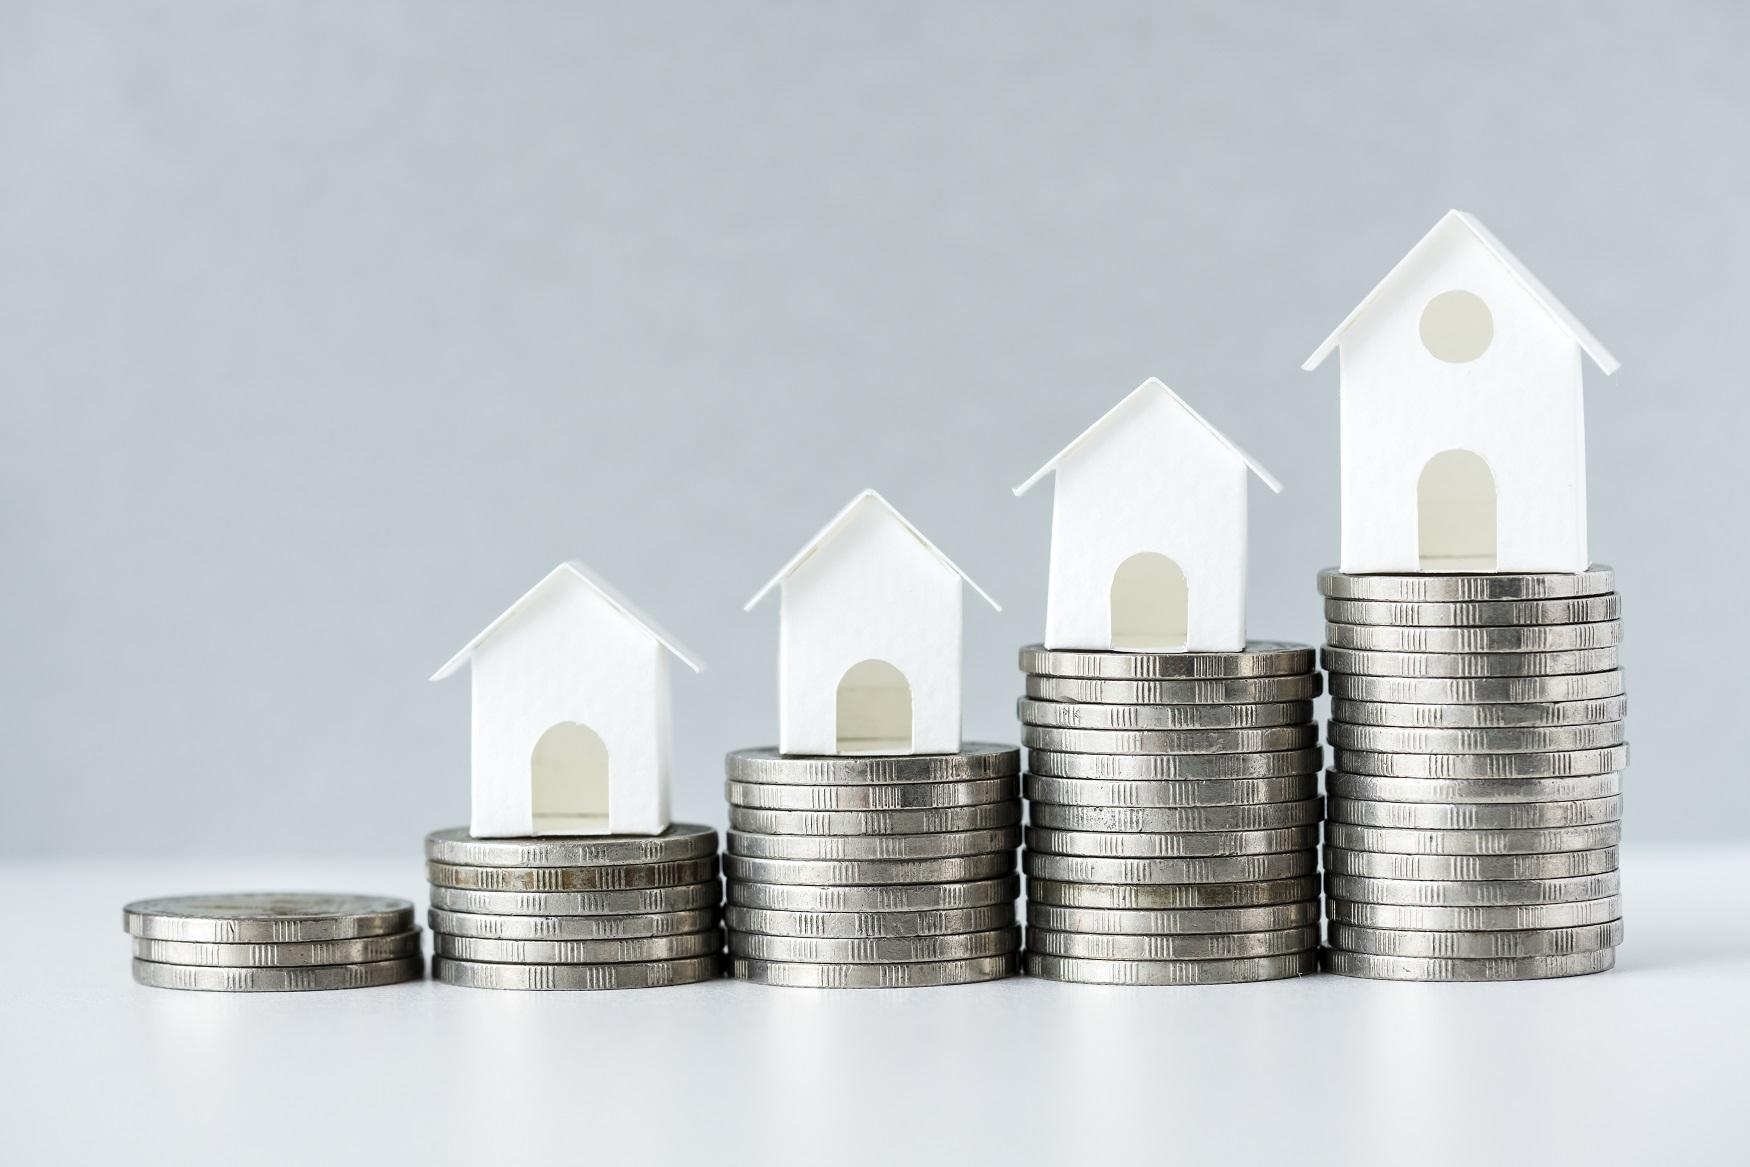 pueblo va loans fixed rate vs adjustable